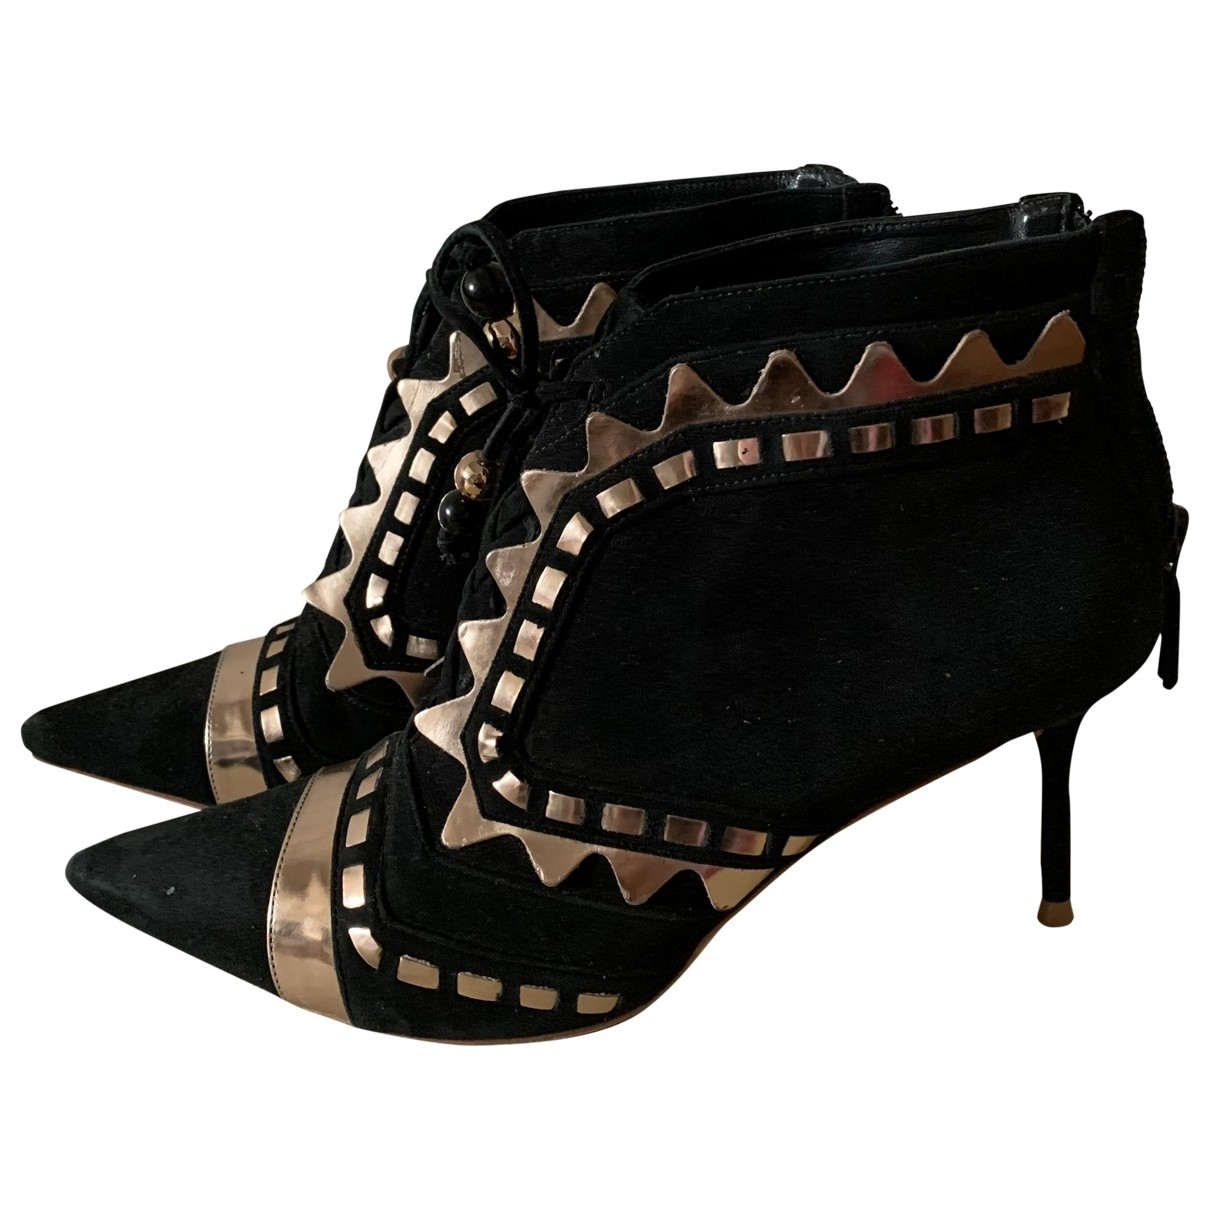 Sophia Webster \N Black Suede Ankle boots for Women 37 EU